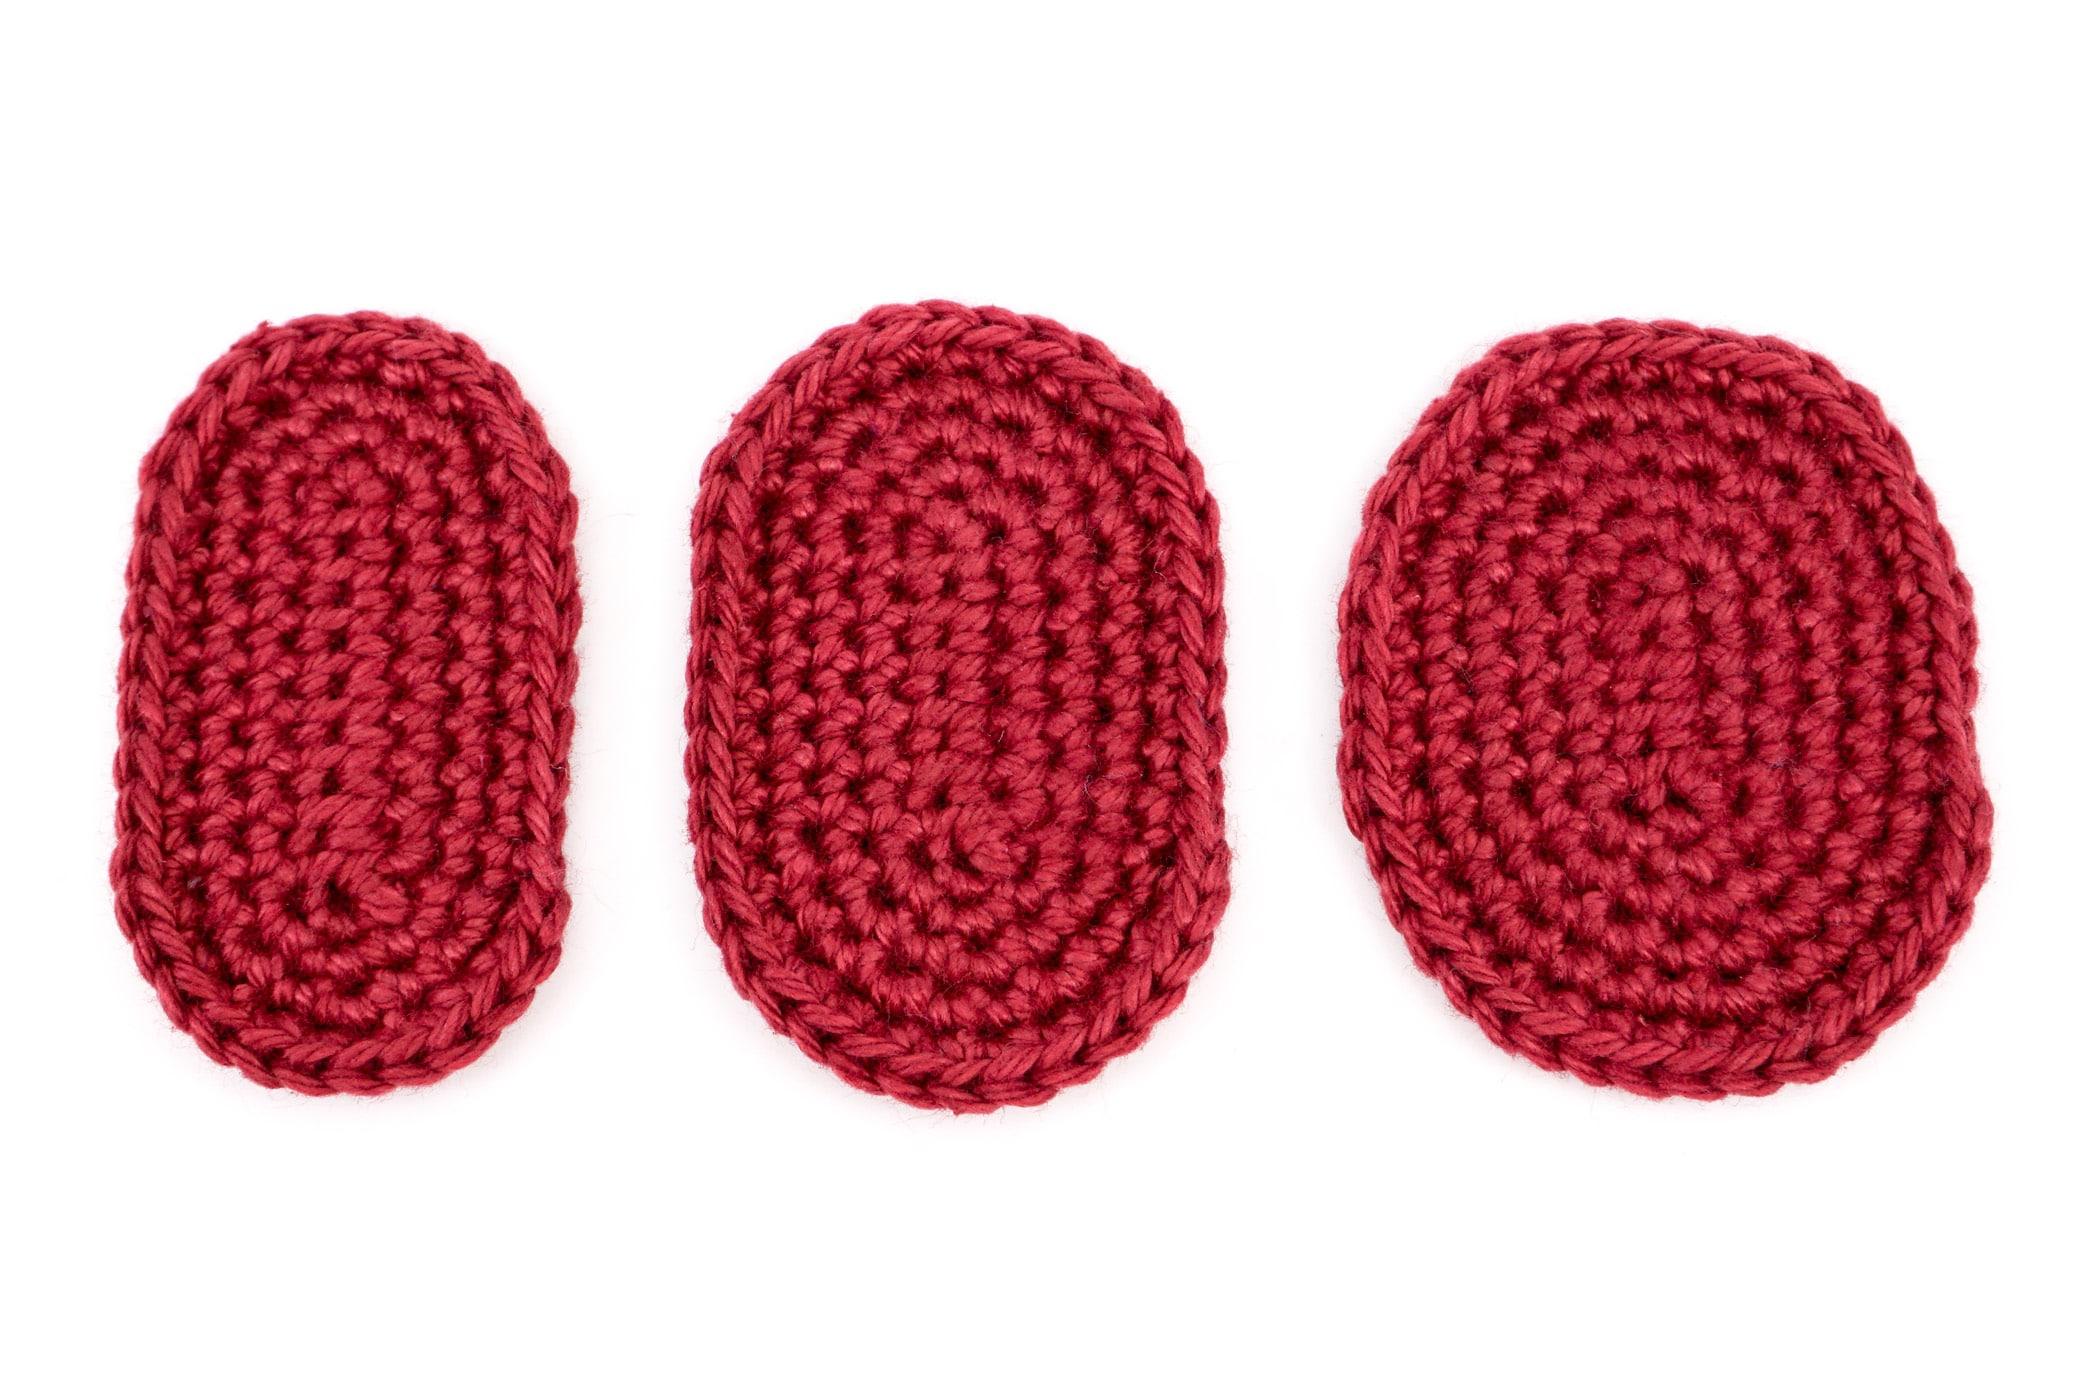 How To Crochet An Oval Shape · How To Make A Crochet · Yarncraft ... | 1400x2100